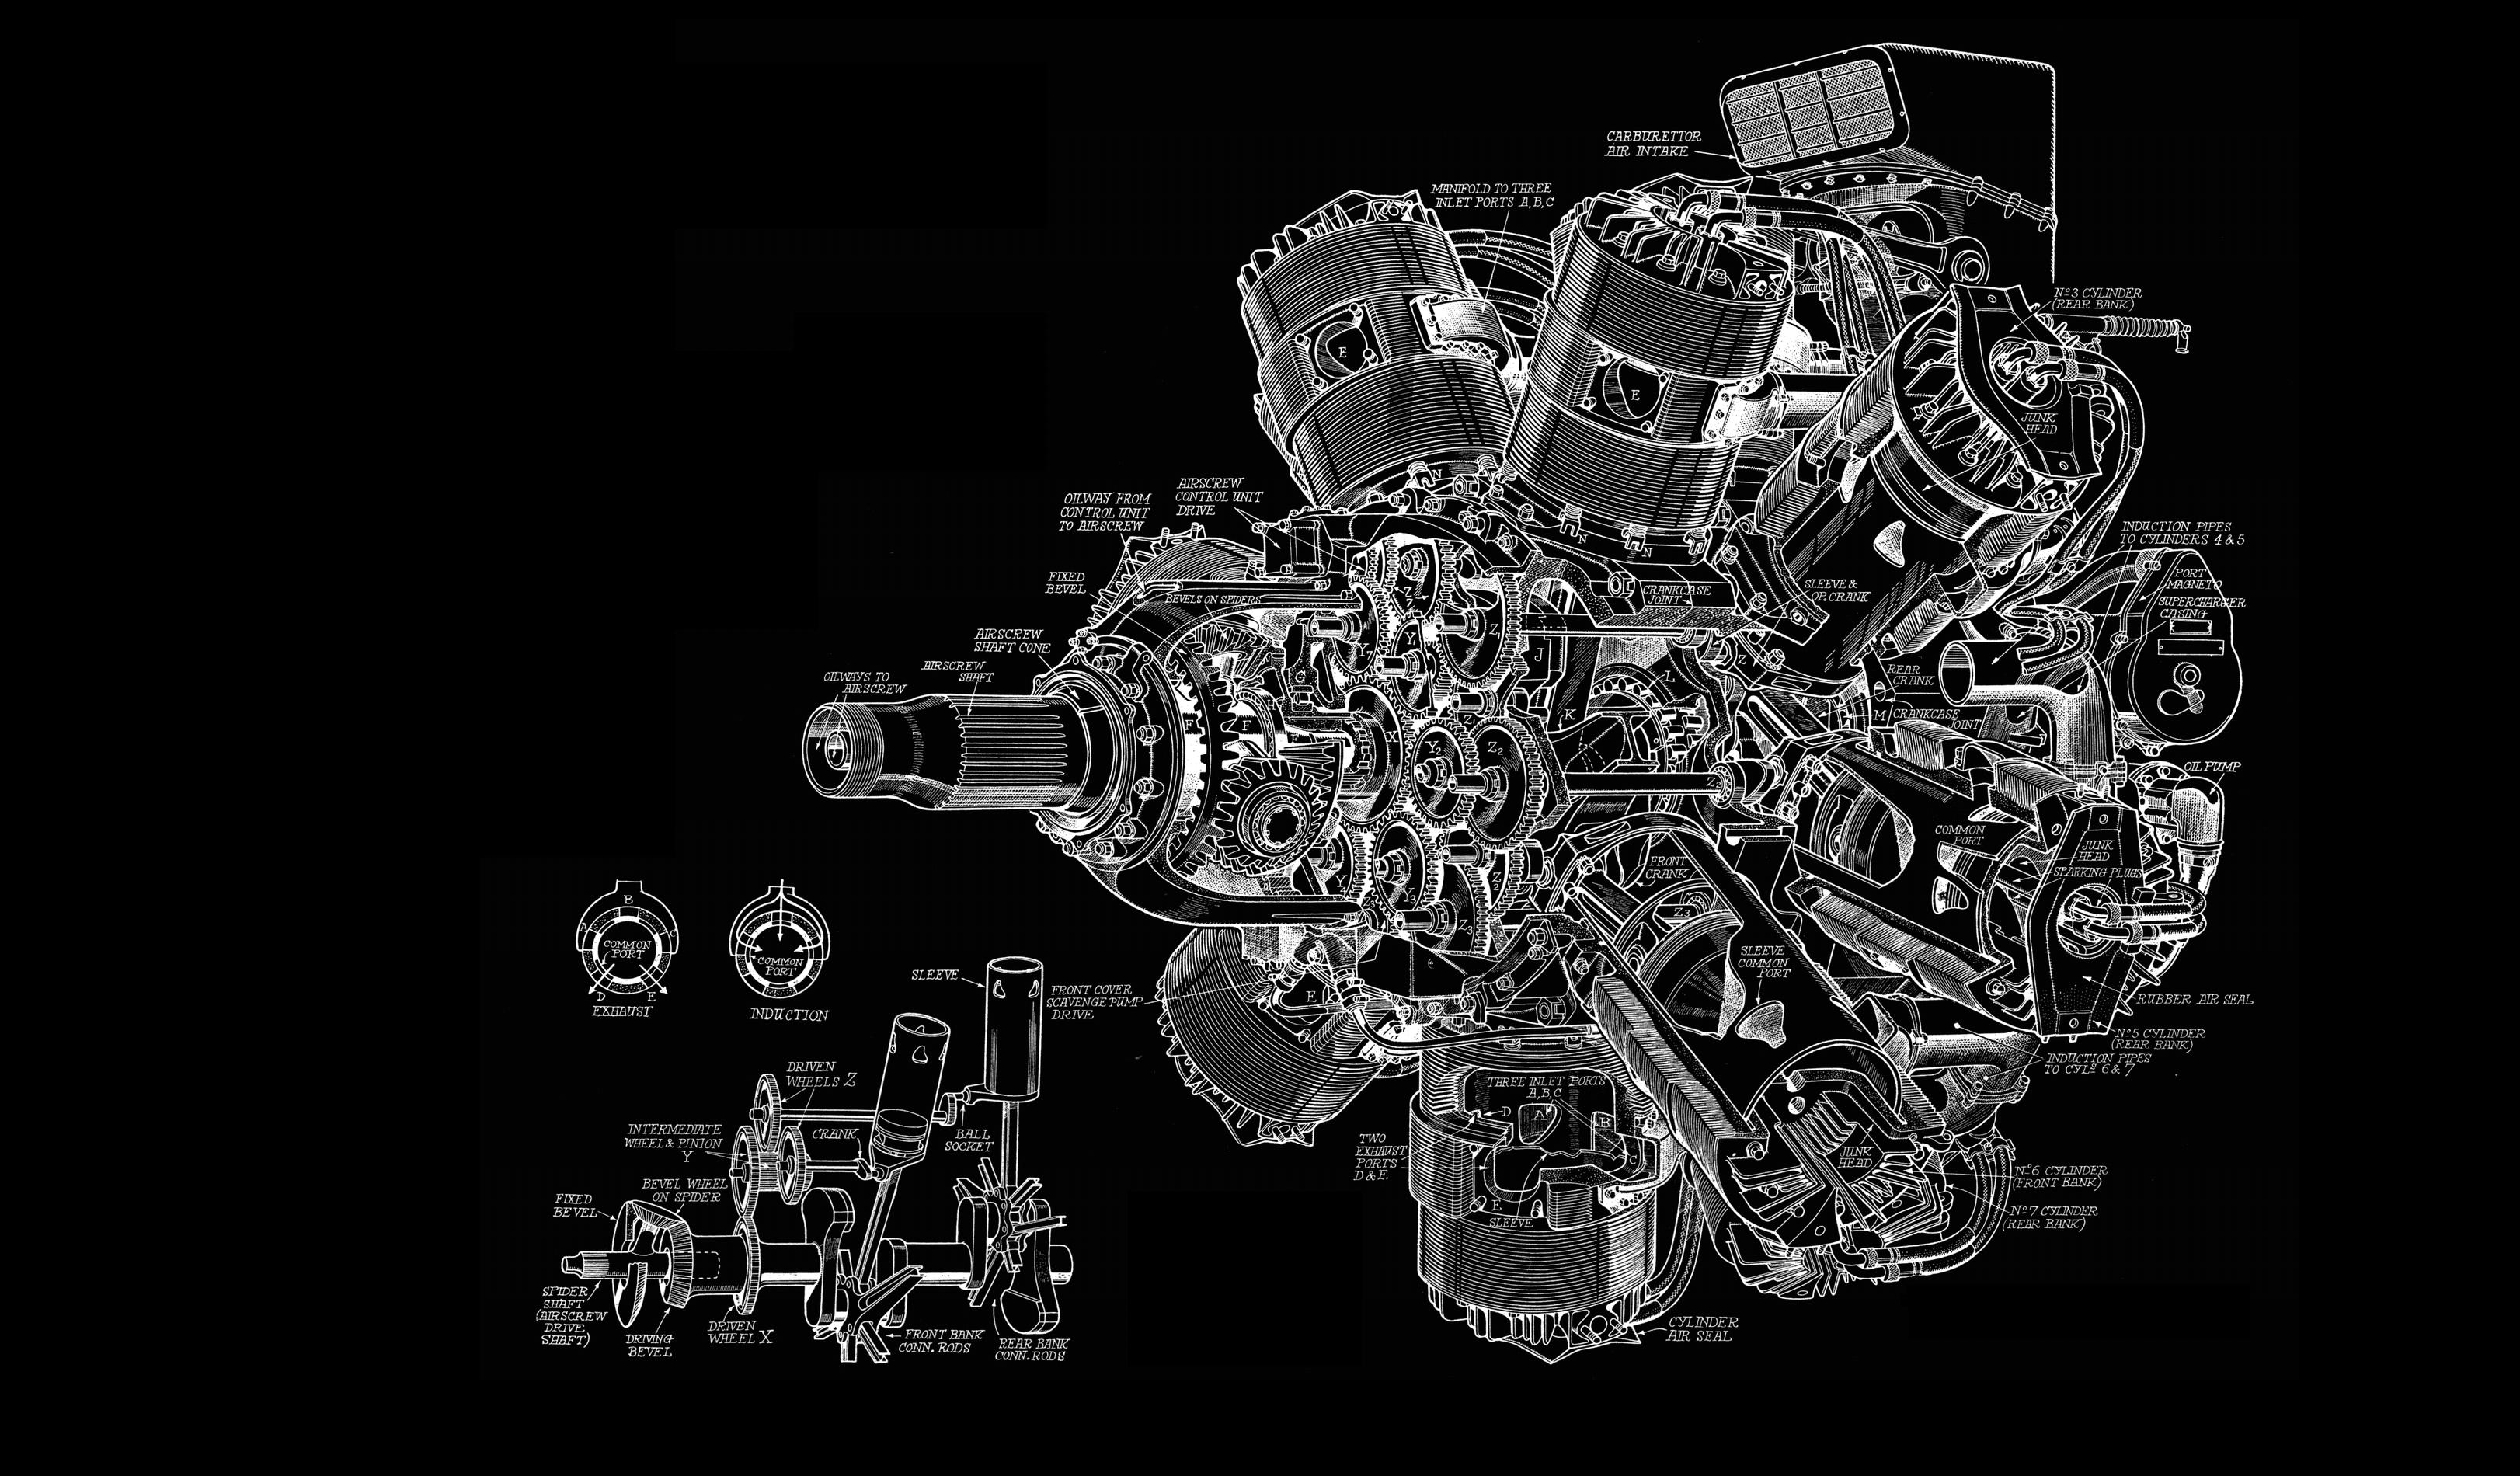 Engine Diagram Bw Black Aircraft Airplane Wallpaper 3244x1900 Piston 45219 Wallpaperup